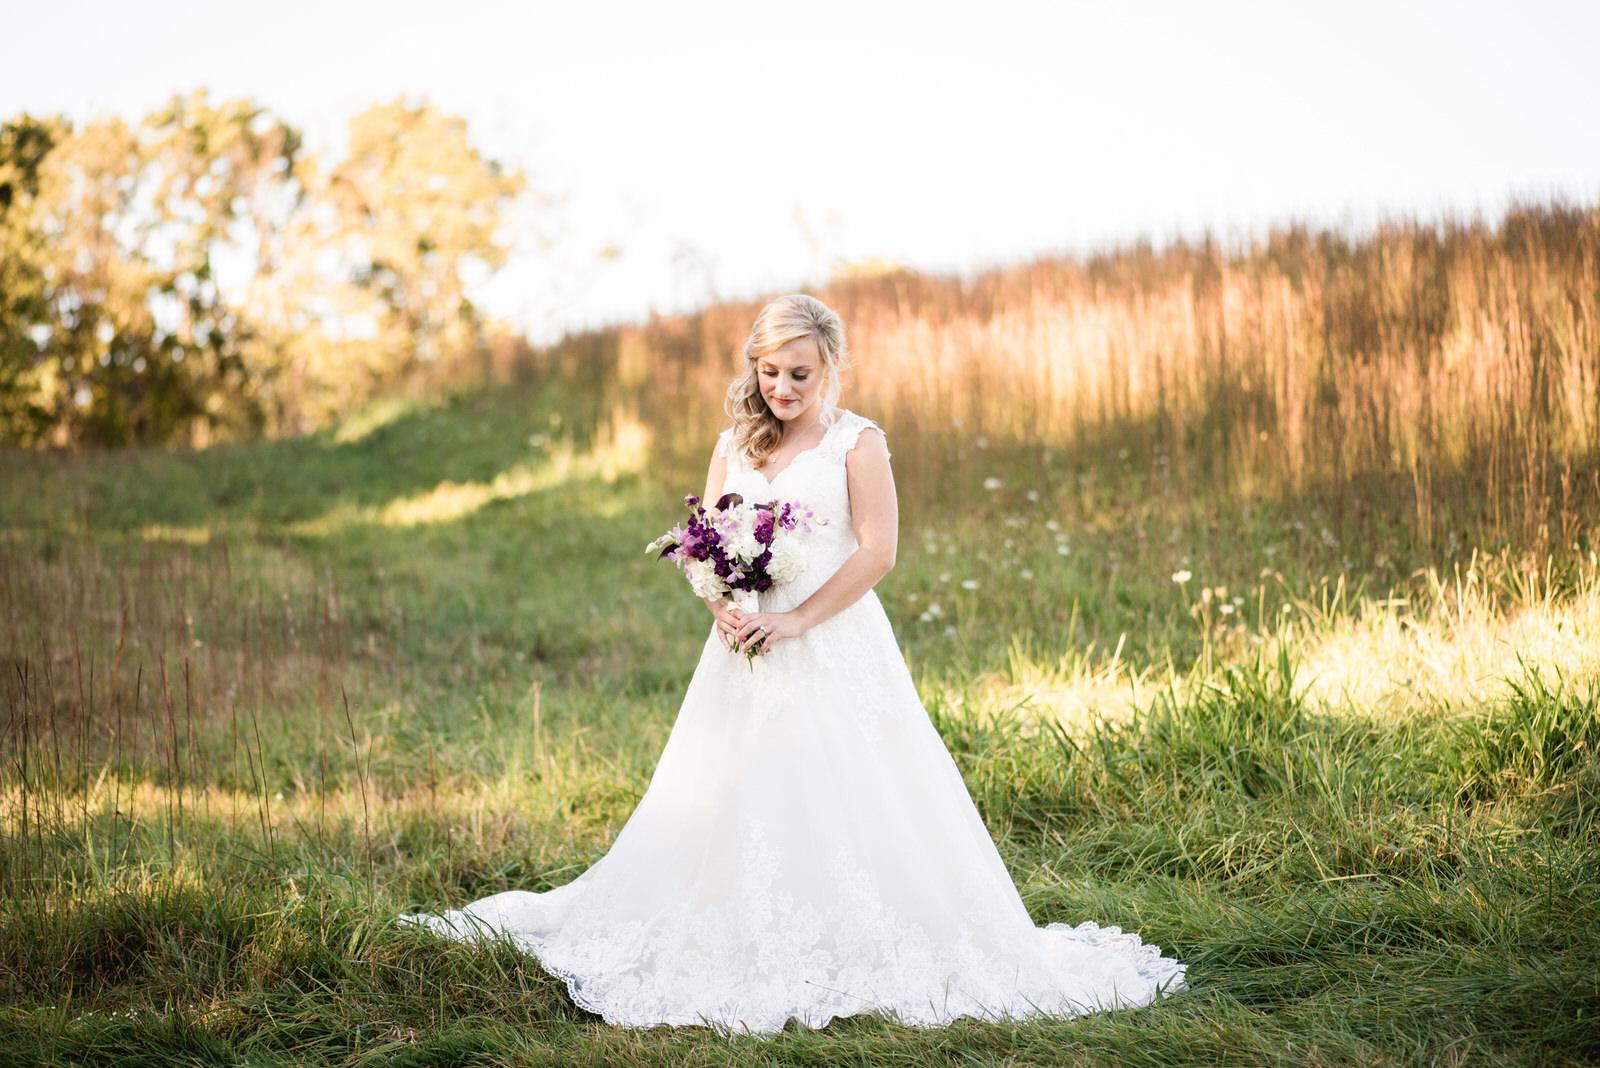 wedding_at_red_fox_winery_wedding_photographer033.jpg